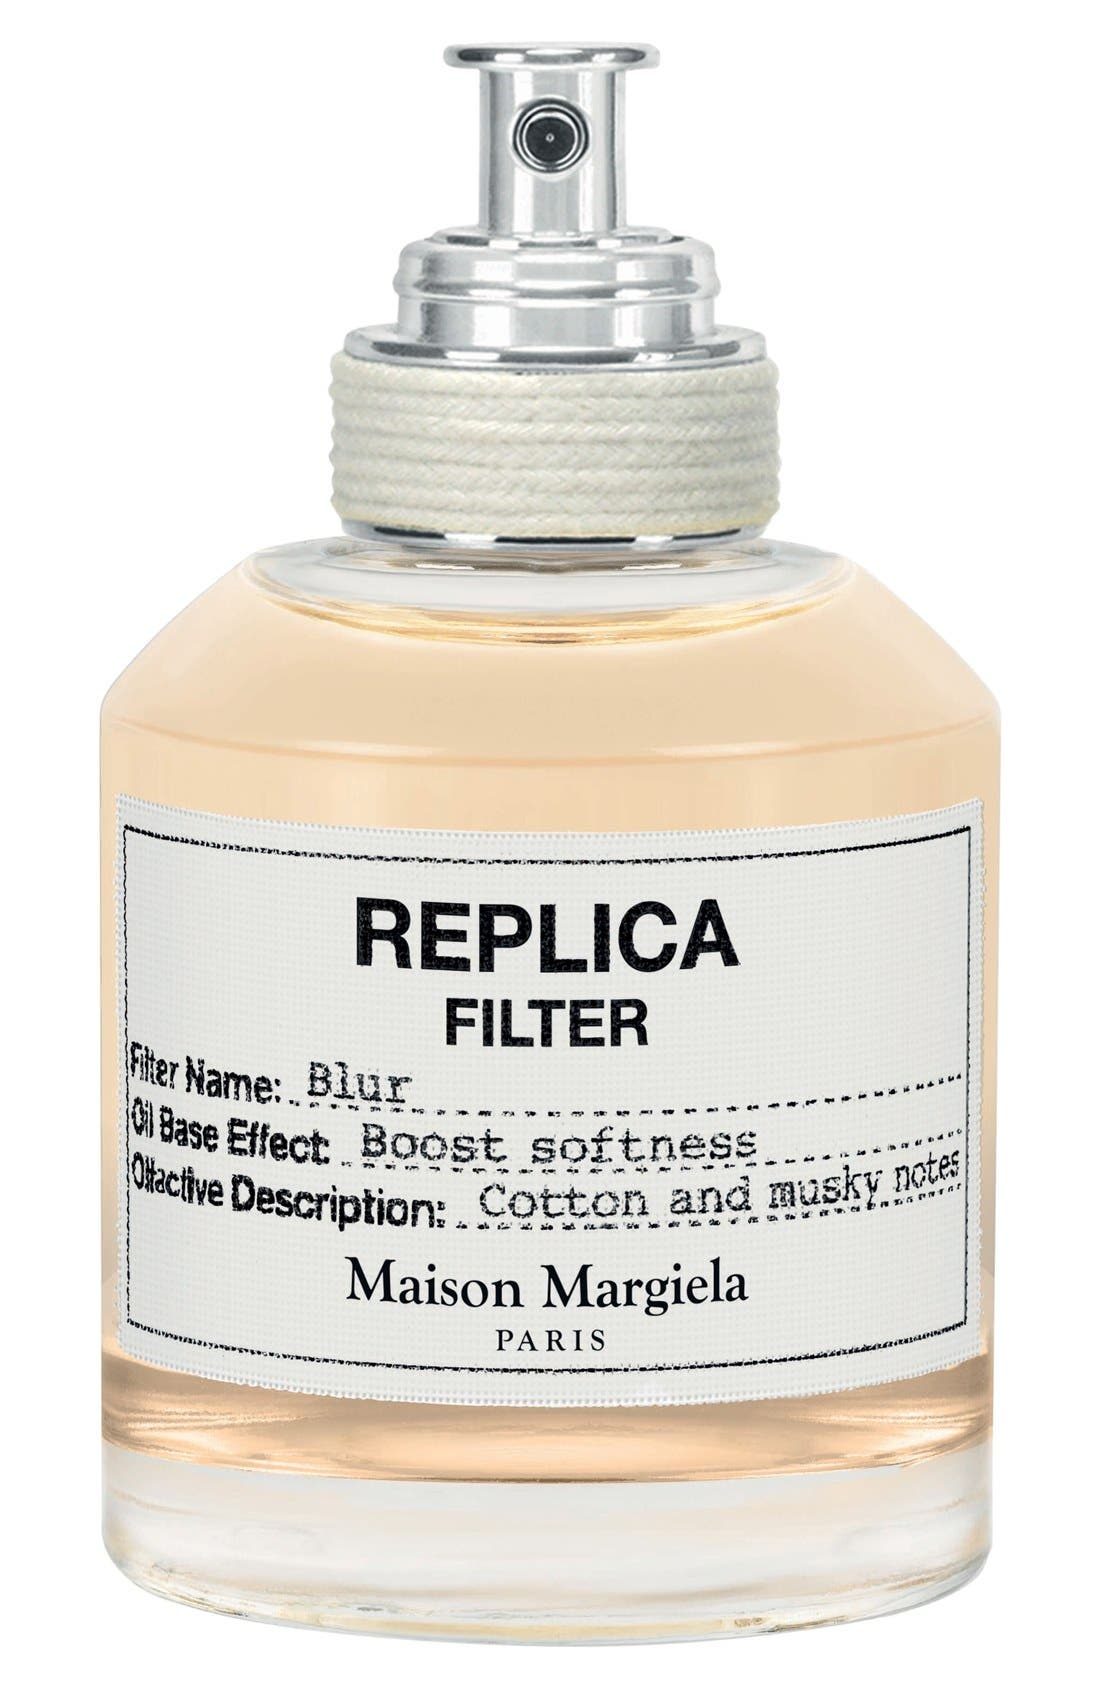 MAISON MARGIELA, Replica Filter Blur Fragrance Primer, Main thumbnail 1, color, NO COLOR